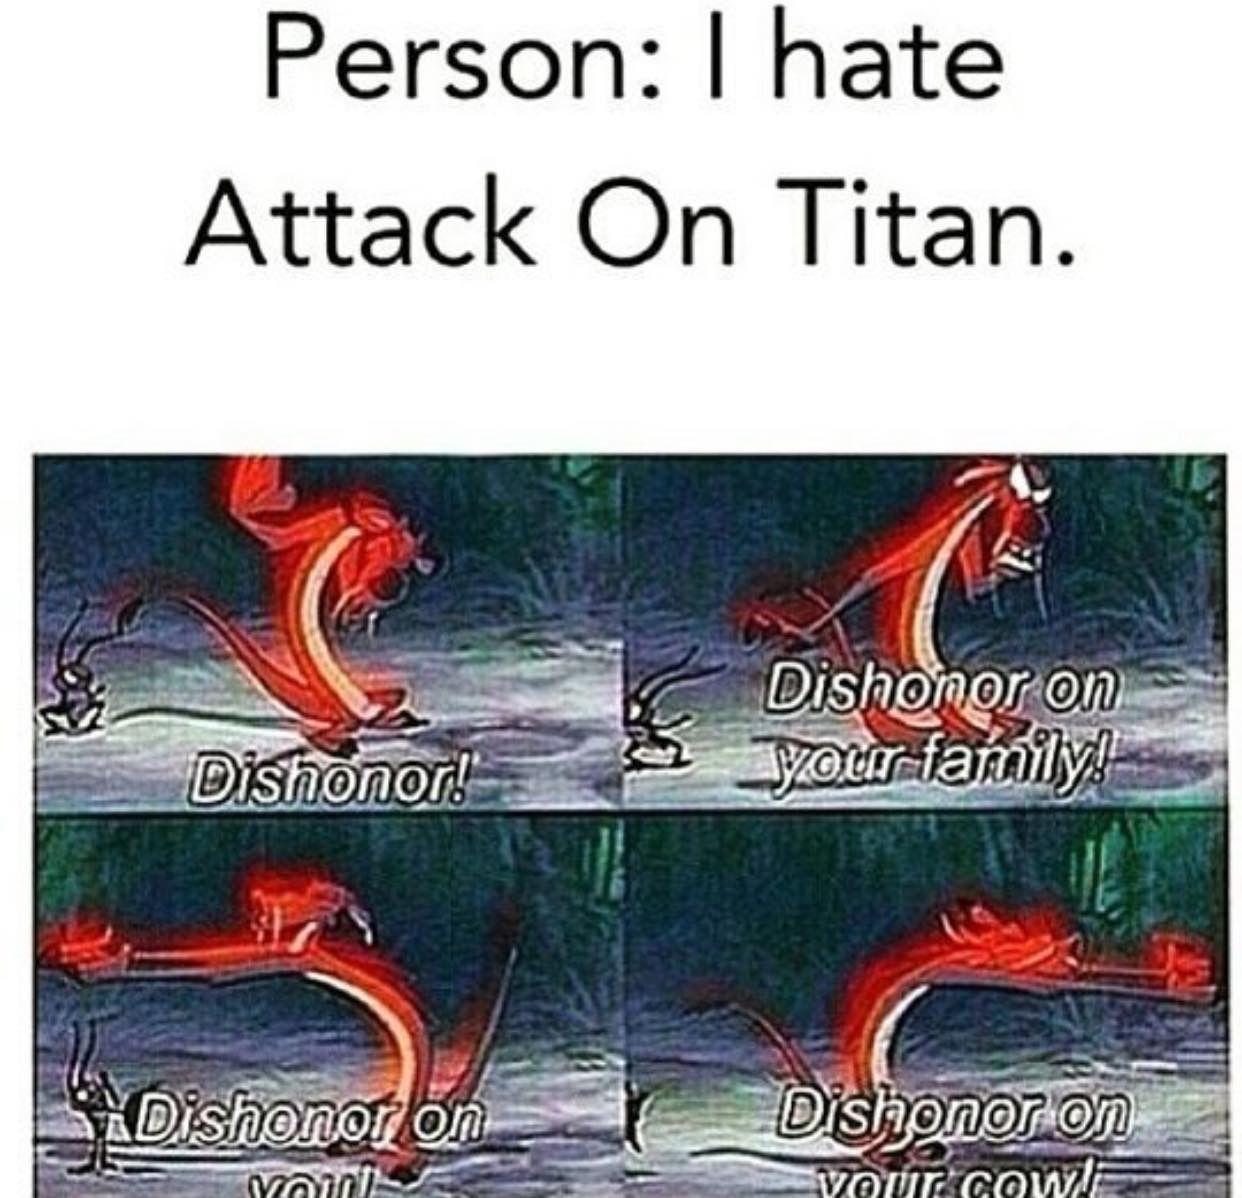 Shingeki No kyojin memes  Attack on titan, Attack on titan funny, Anime memes funny